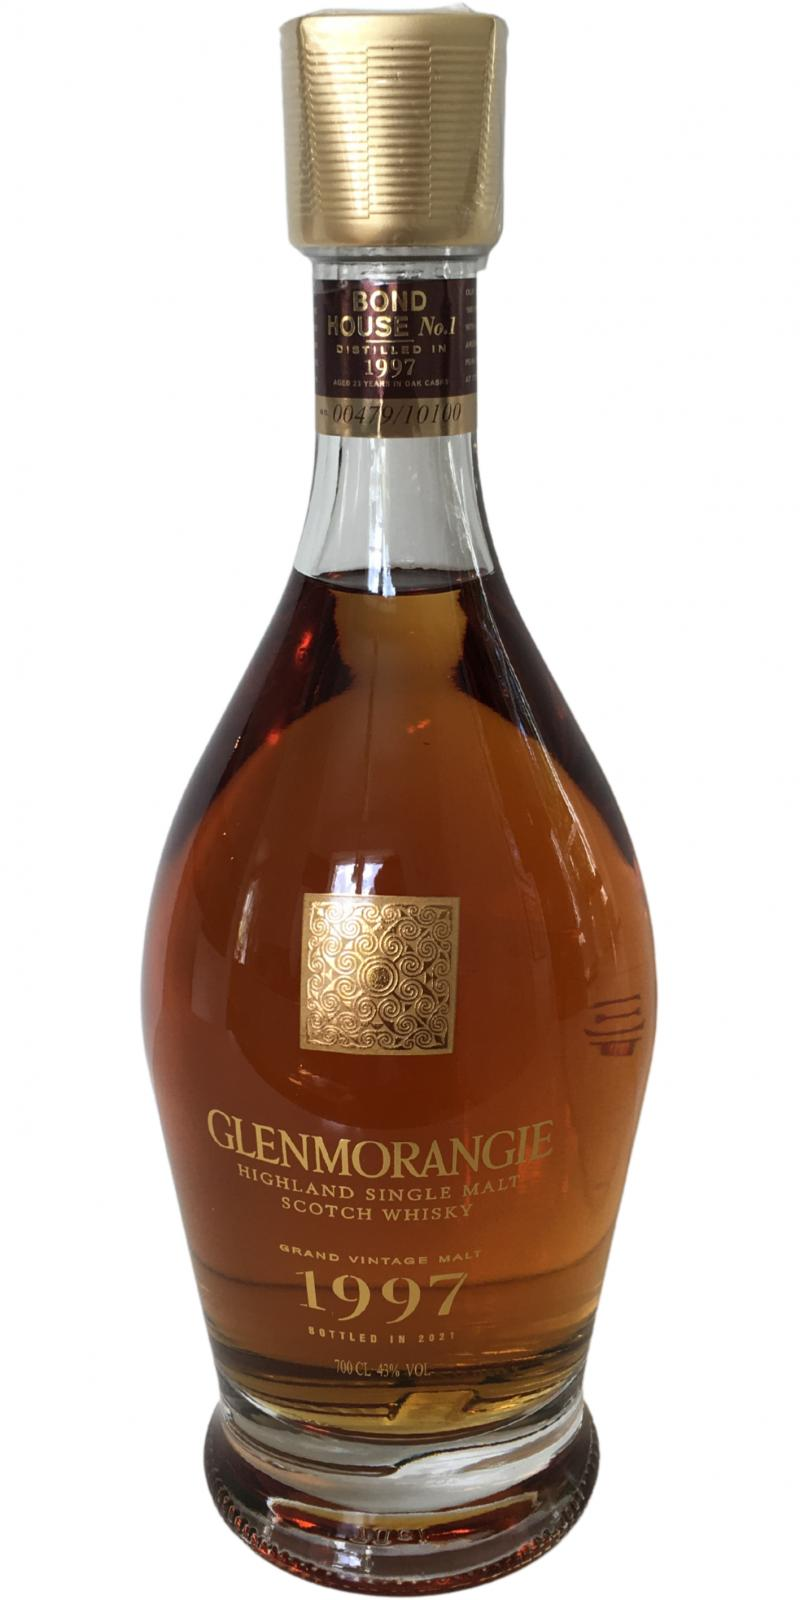 Glenmorangie 1997